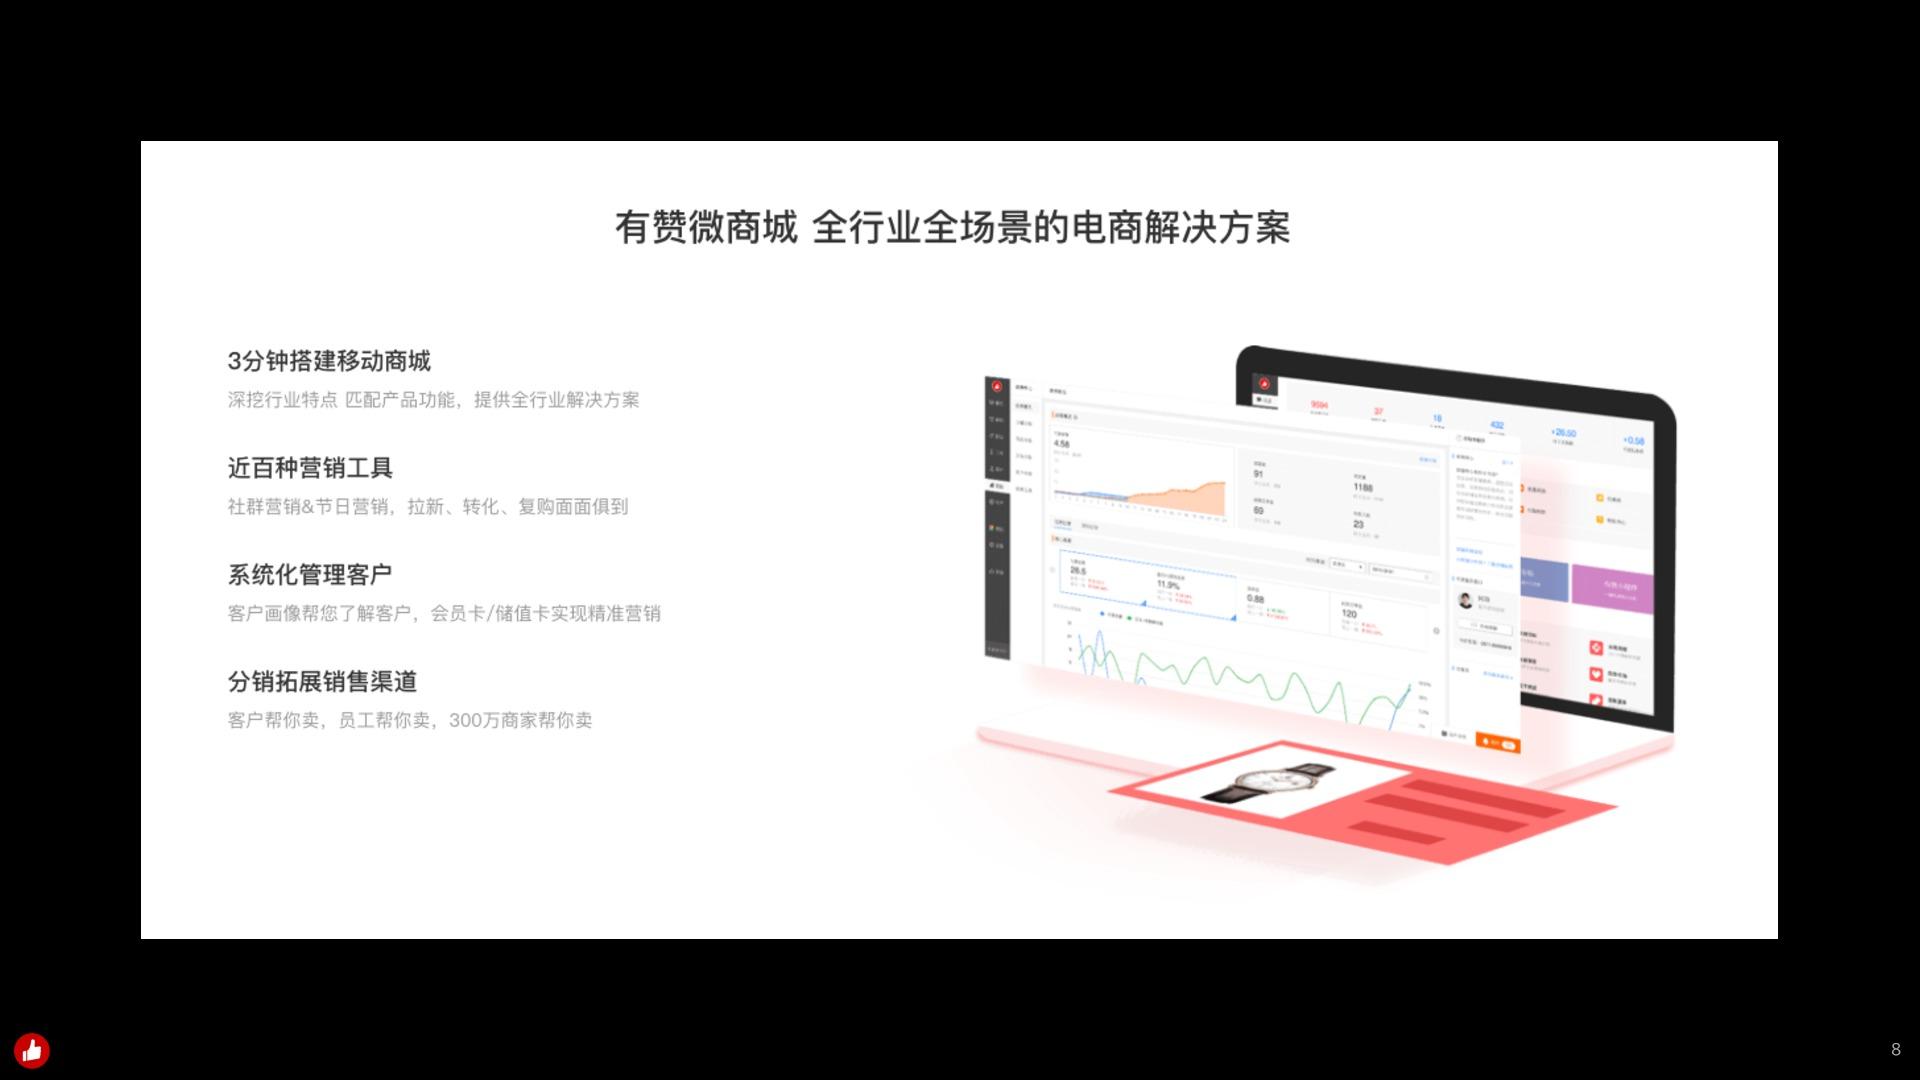 https://opentalk-blog.b0.upaiyun.com/prod/2018-11-26/fbe52912d2281146a76440b1c120555d